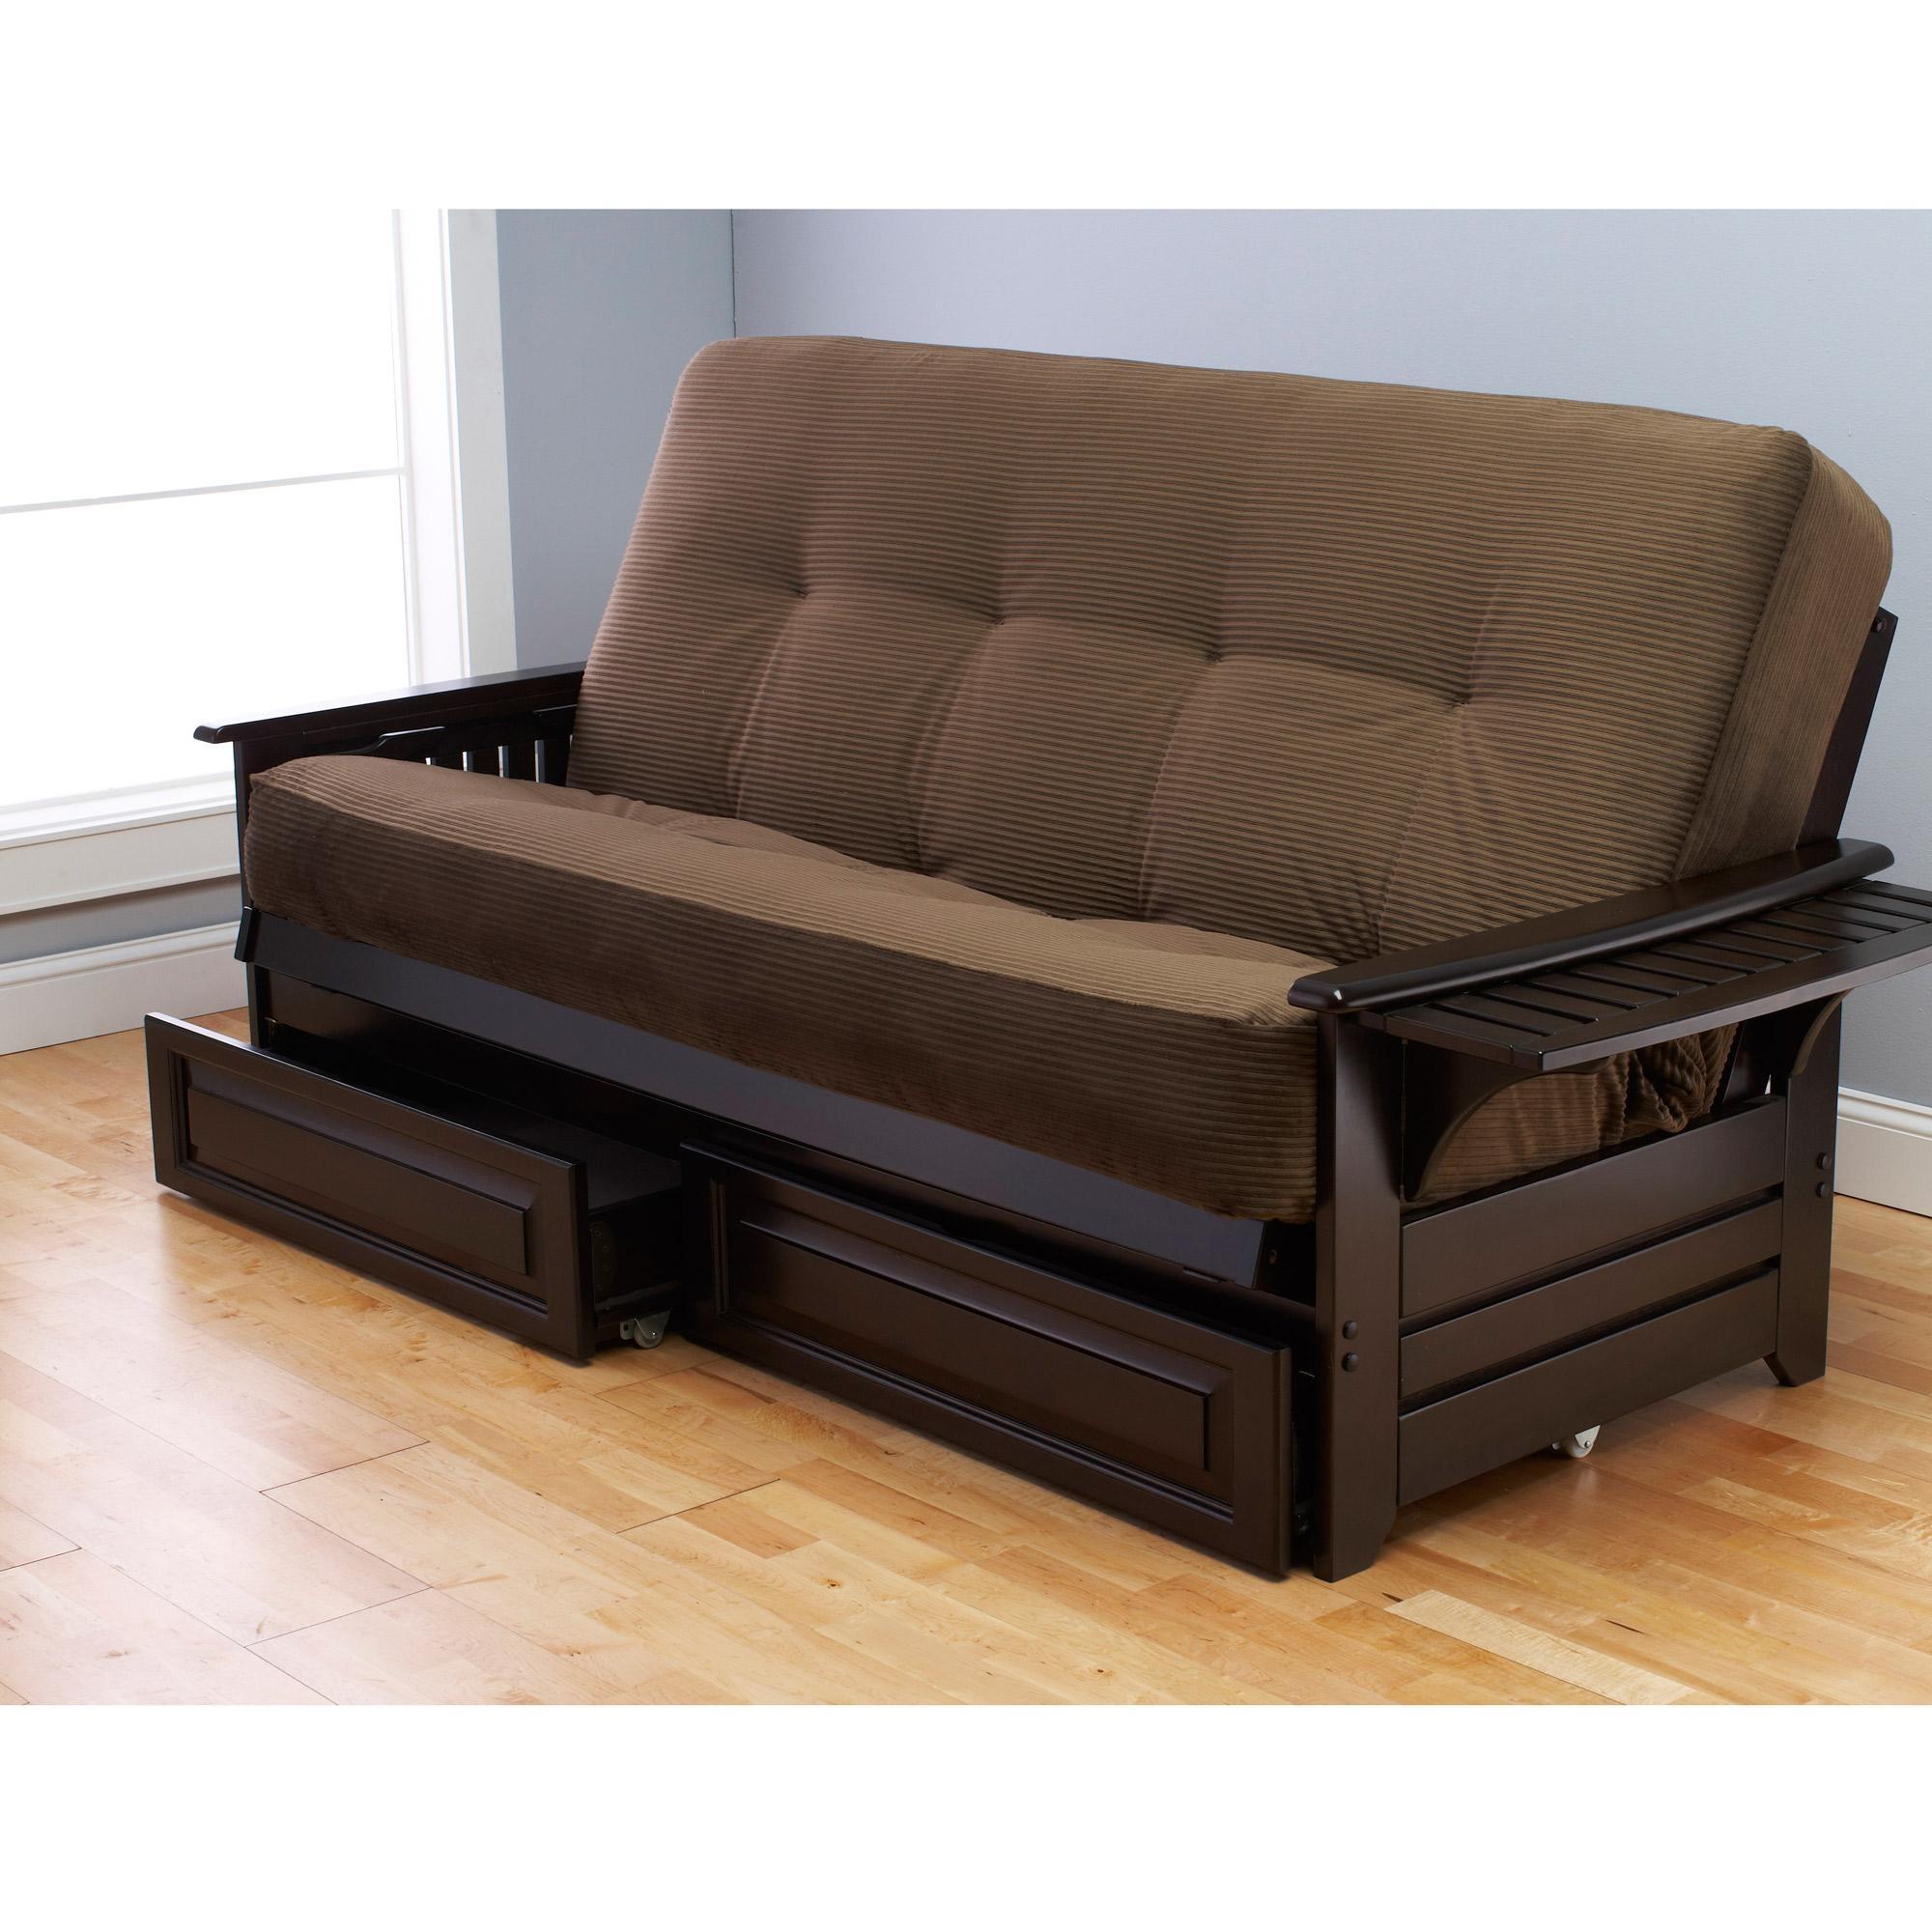 Good Cheap Sofa Beds | Centerfieldbar Throughout Cushion Sofa Beds (View 21 of 23)